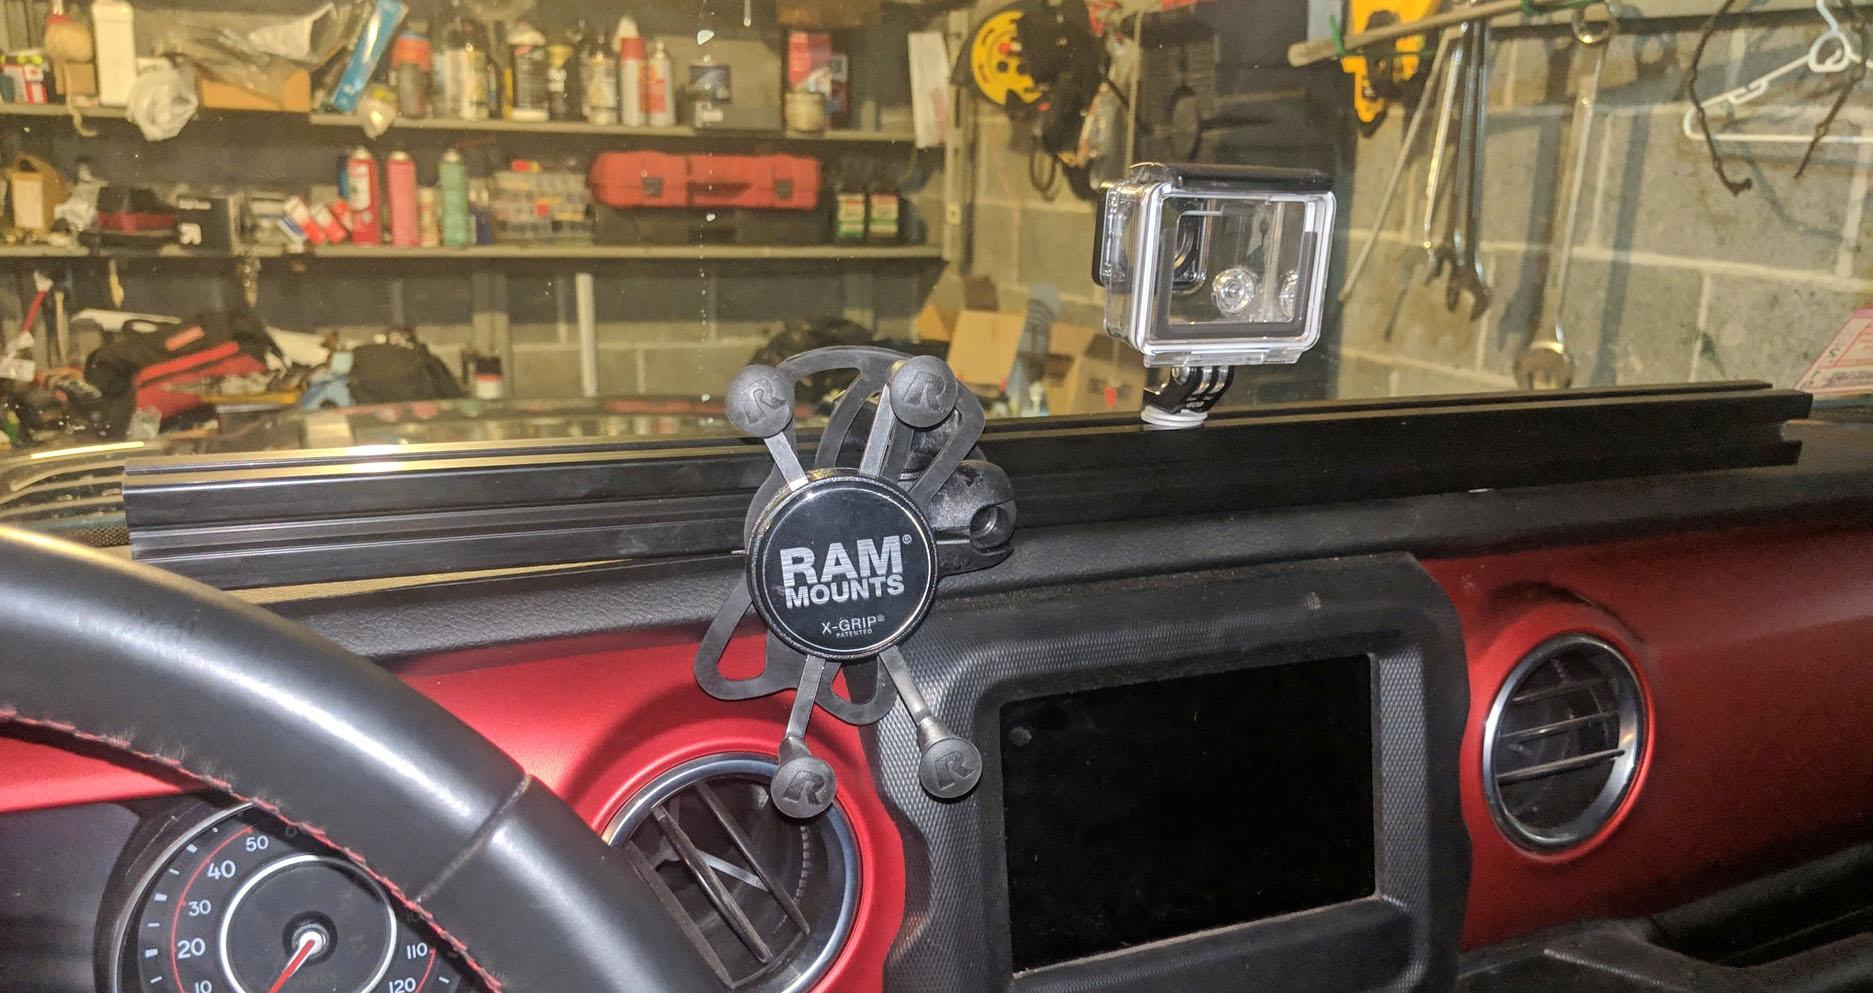 Fabricating A Home Made Dash Rail Mount Bar For Jl Diy